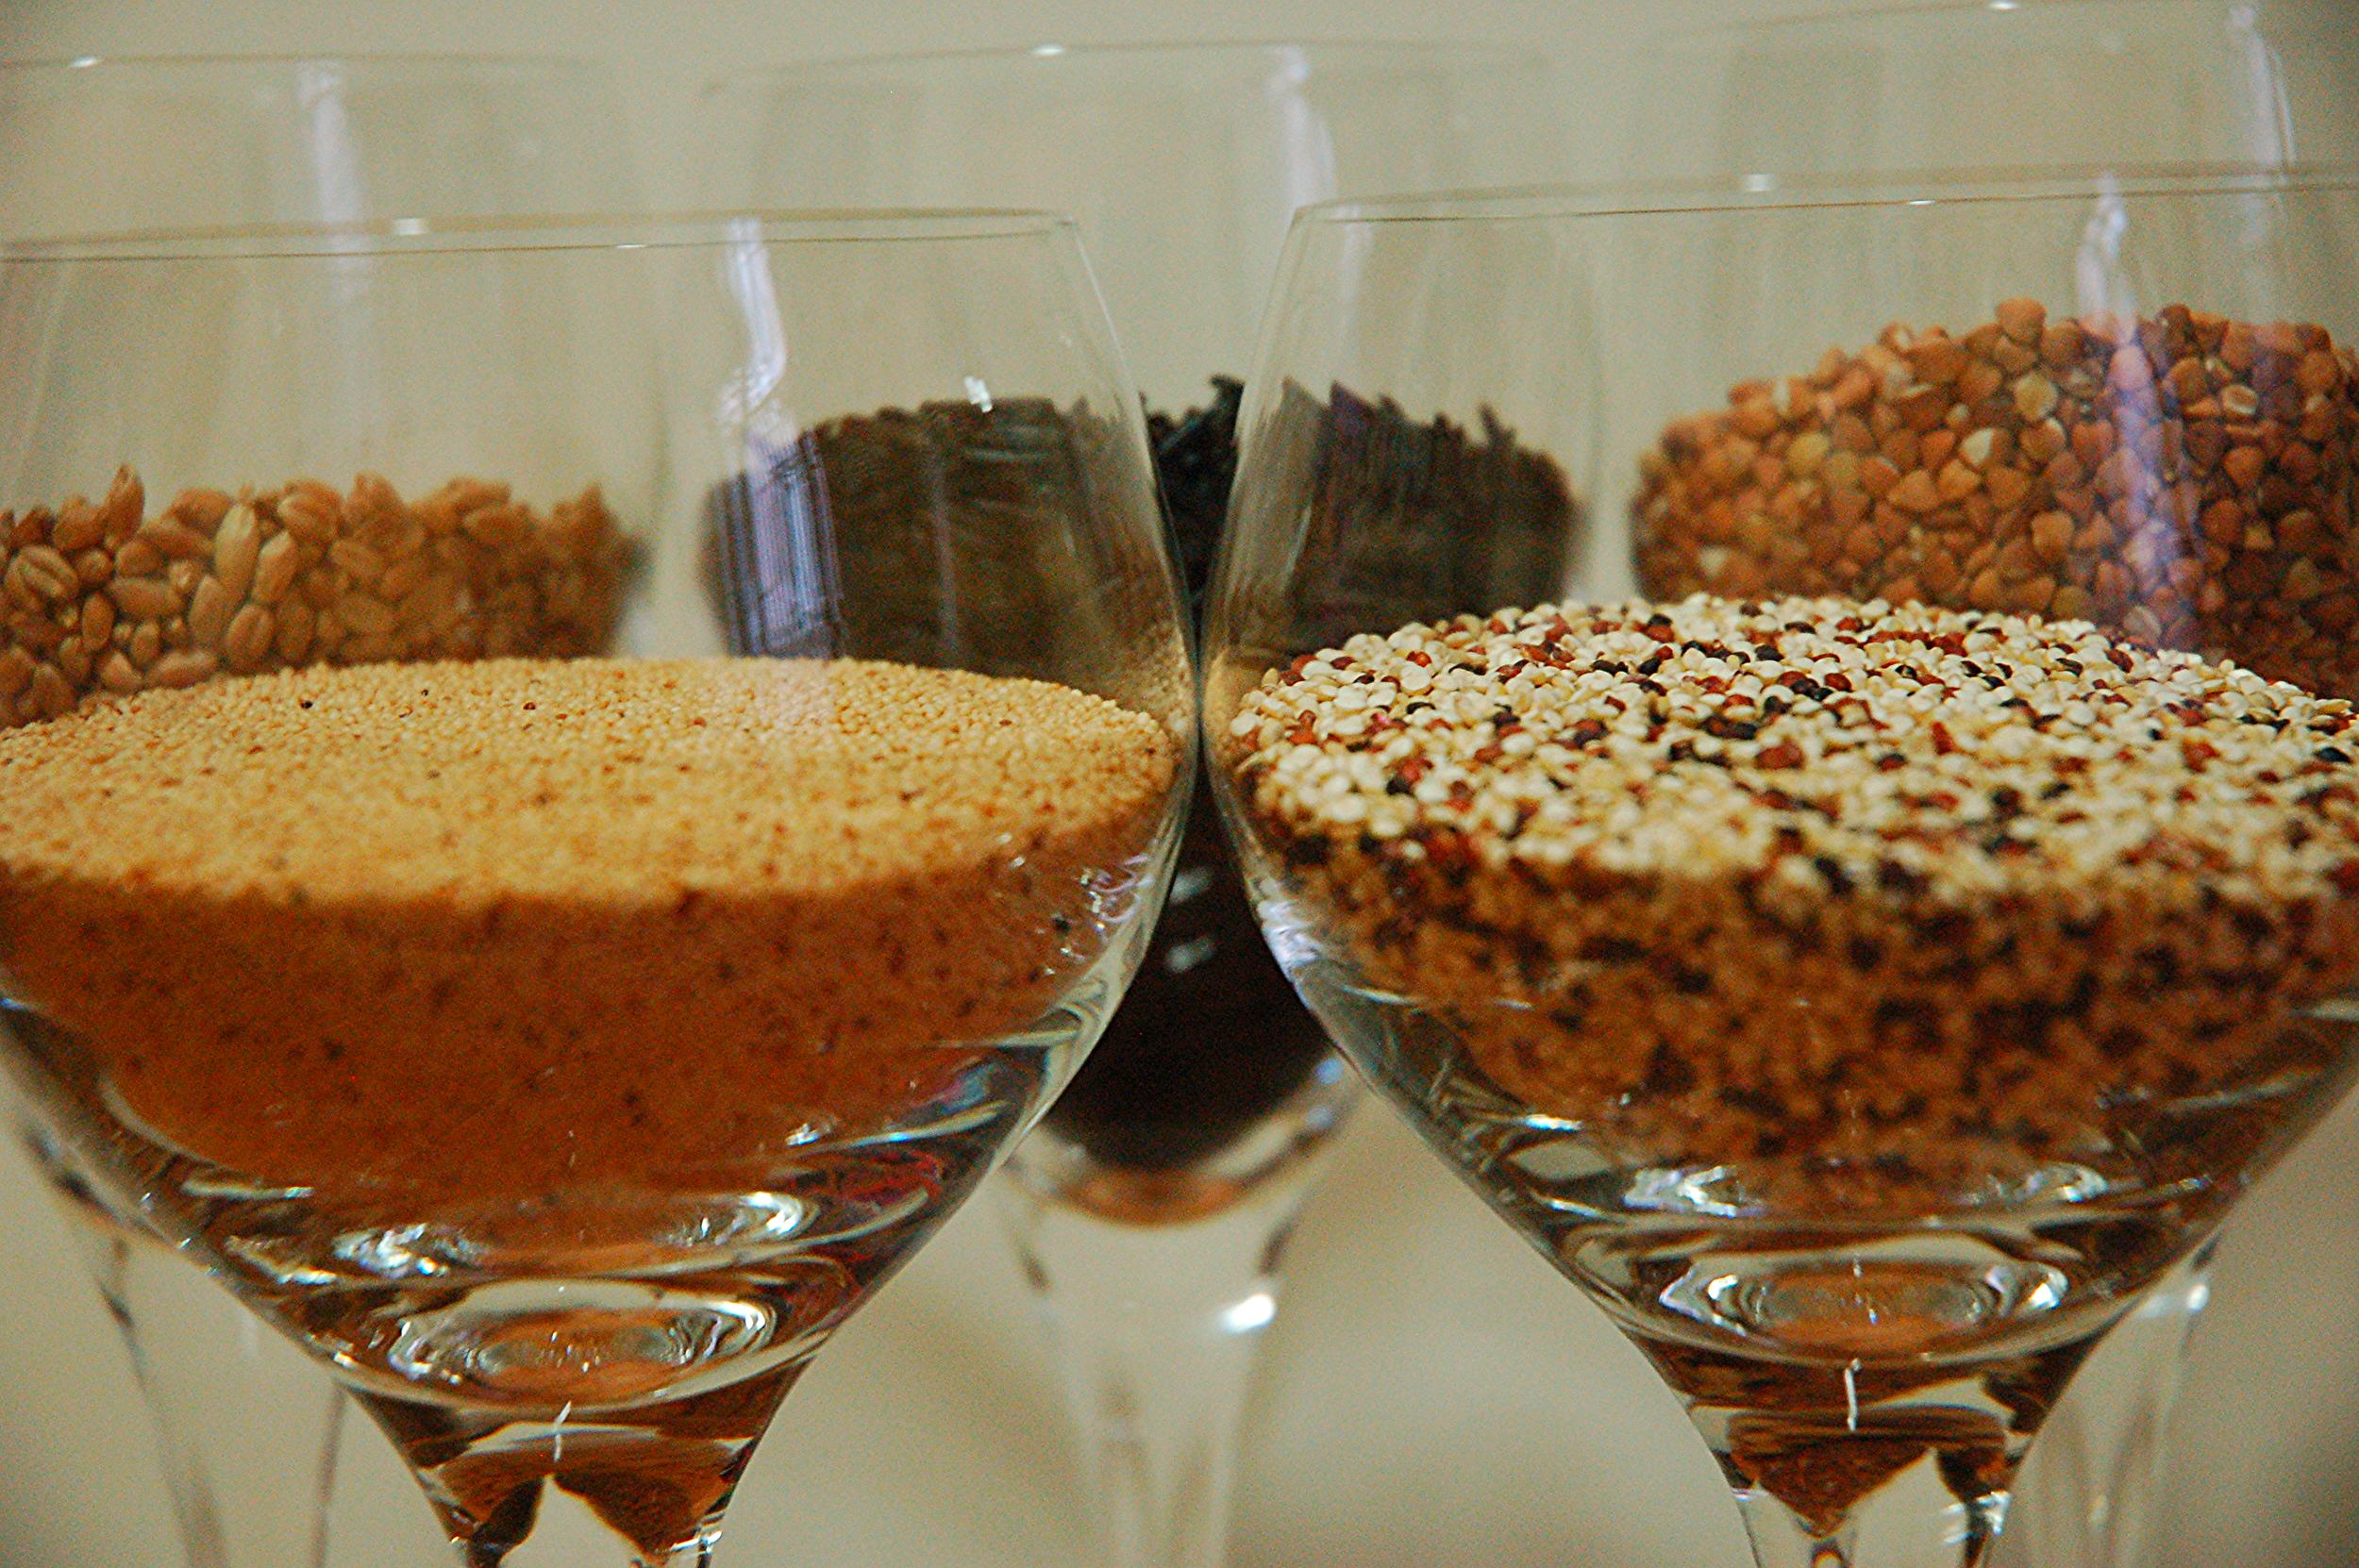 Clockwise from left background: spelt, wild rice, kasha, quinoa, & amaranth